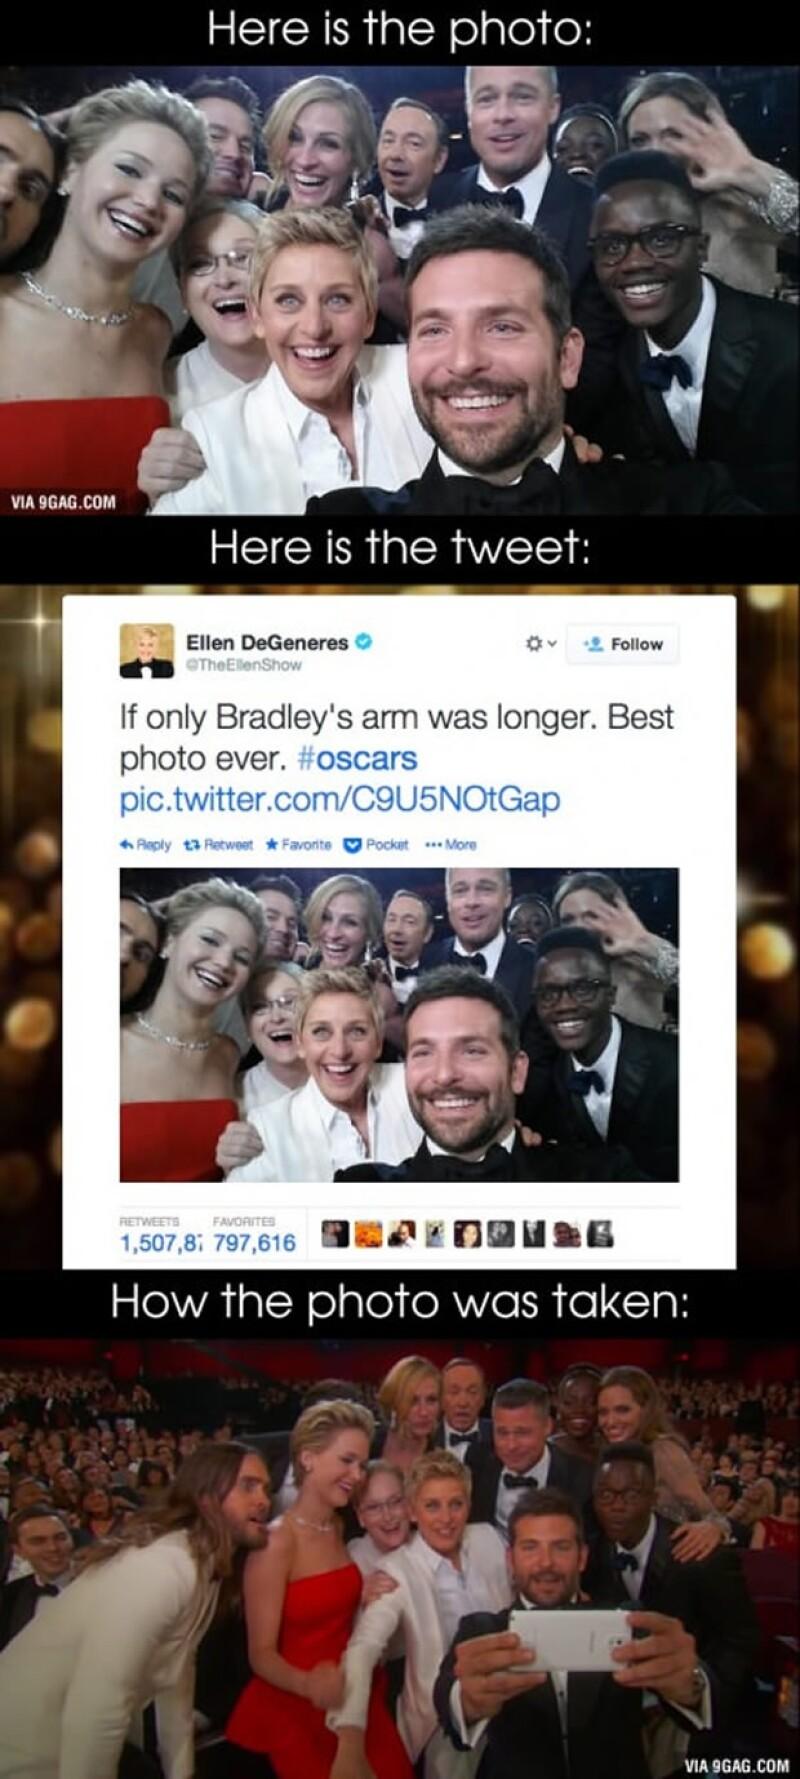 La selfie de Ellen Degeneres logró apoderarse de Twitter.